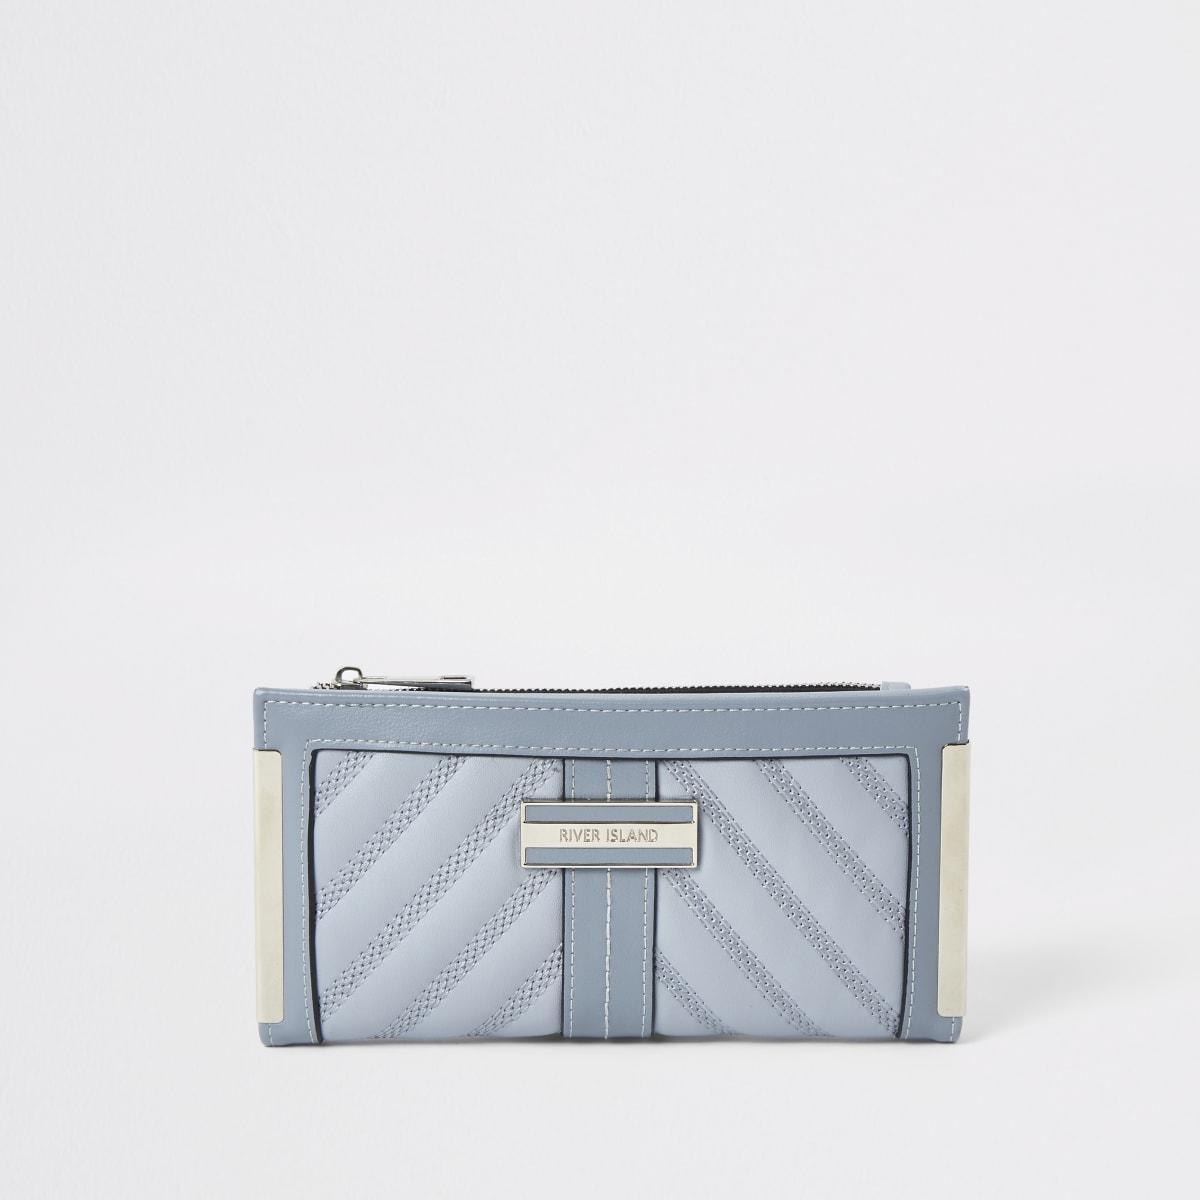 Lichtblauwe doorgestikte uitvouwbare portemonnee